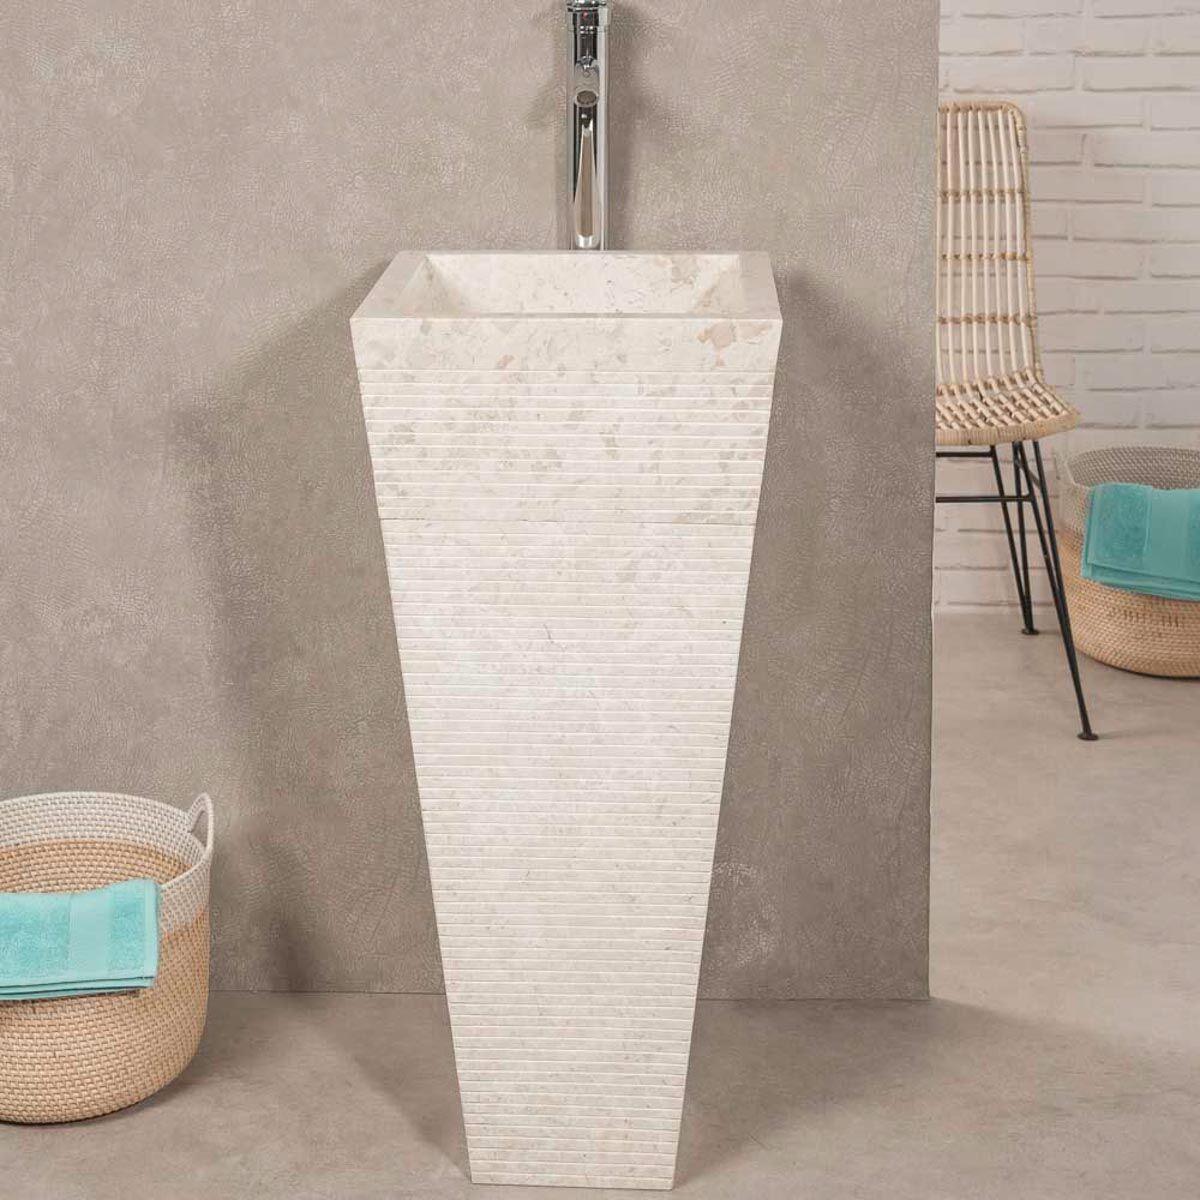 Wanda Collection Vasque salle de bain sur pied en pierre pyramide GUIZEH crème